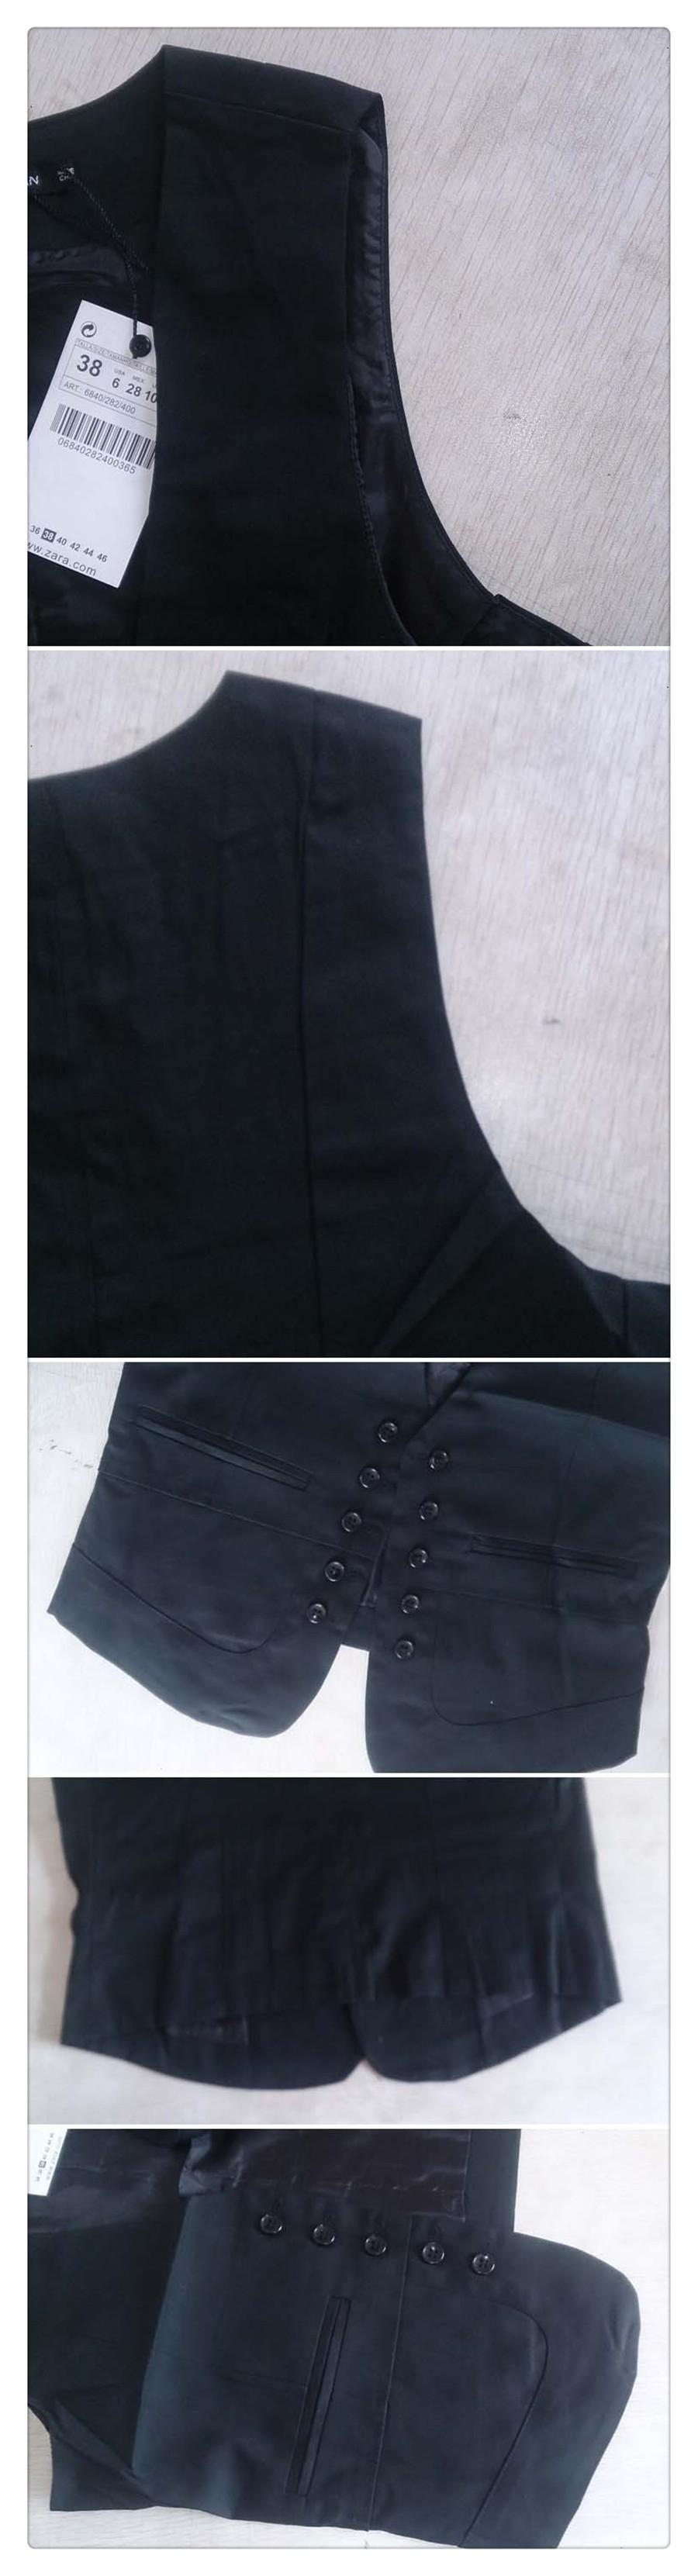 women solid black vest  (4)